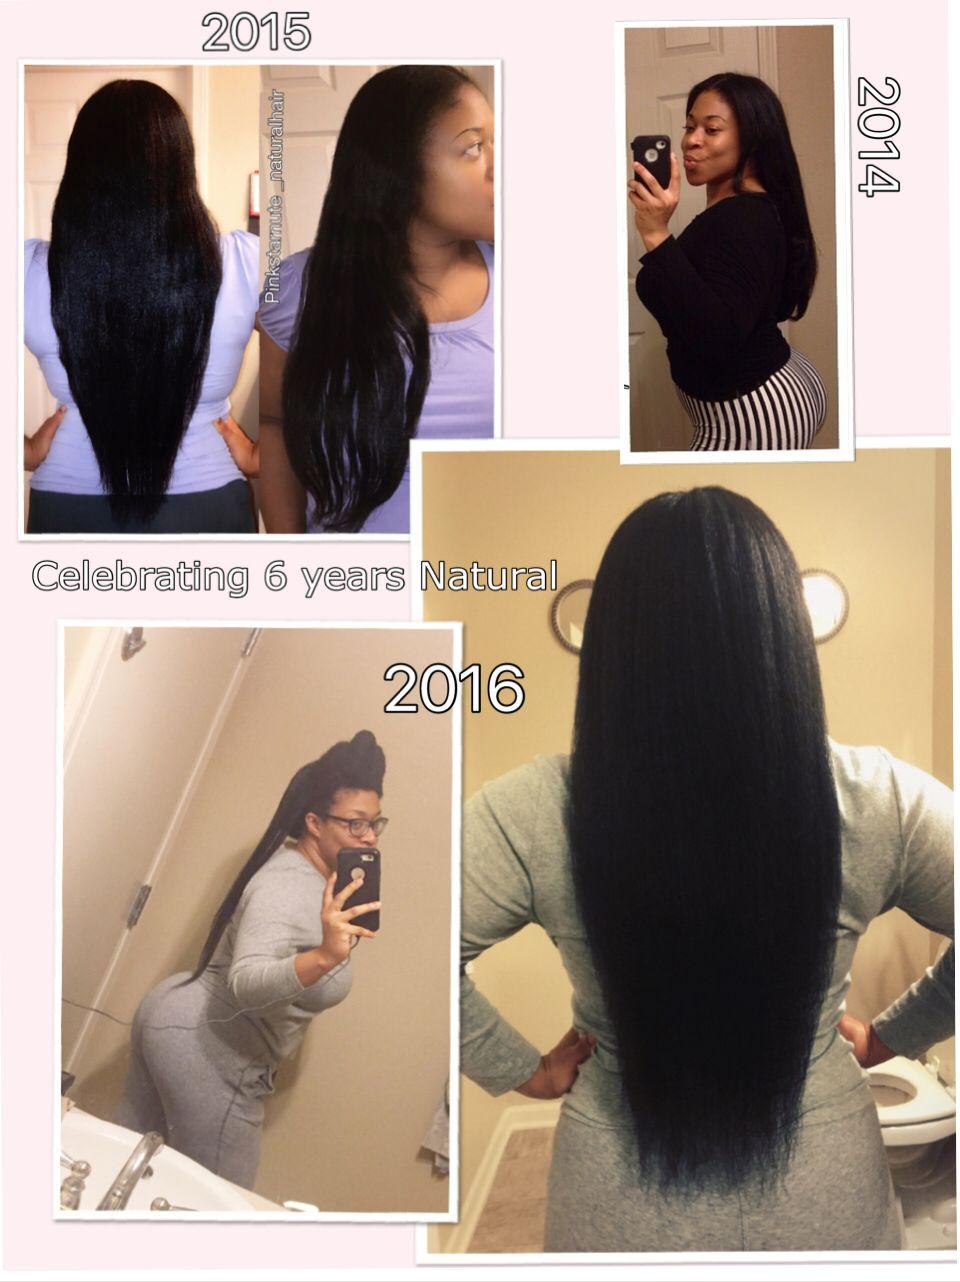 years natural tailbone length natural curls girls